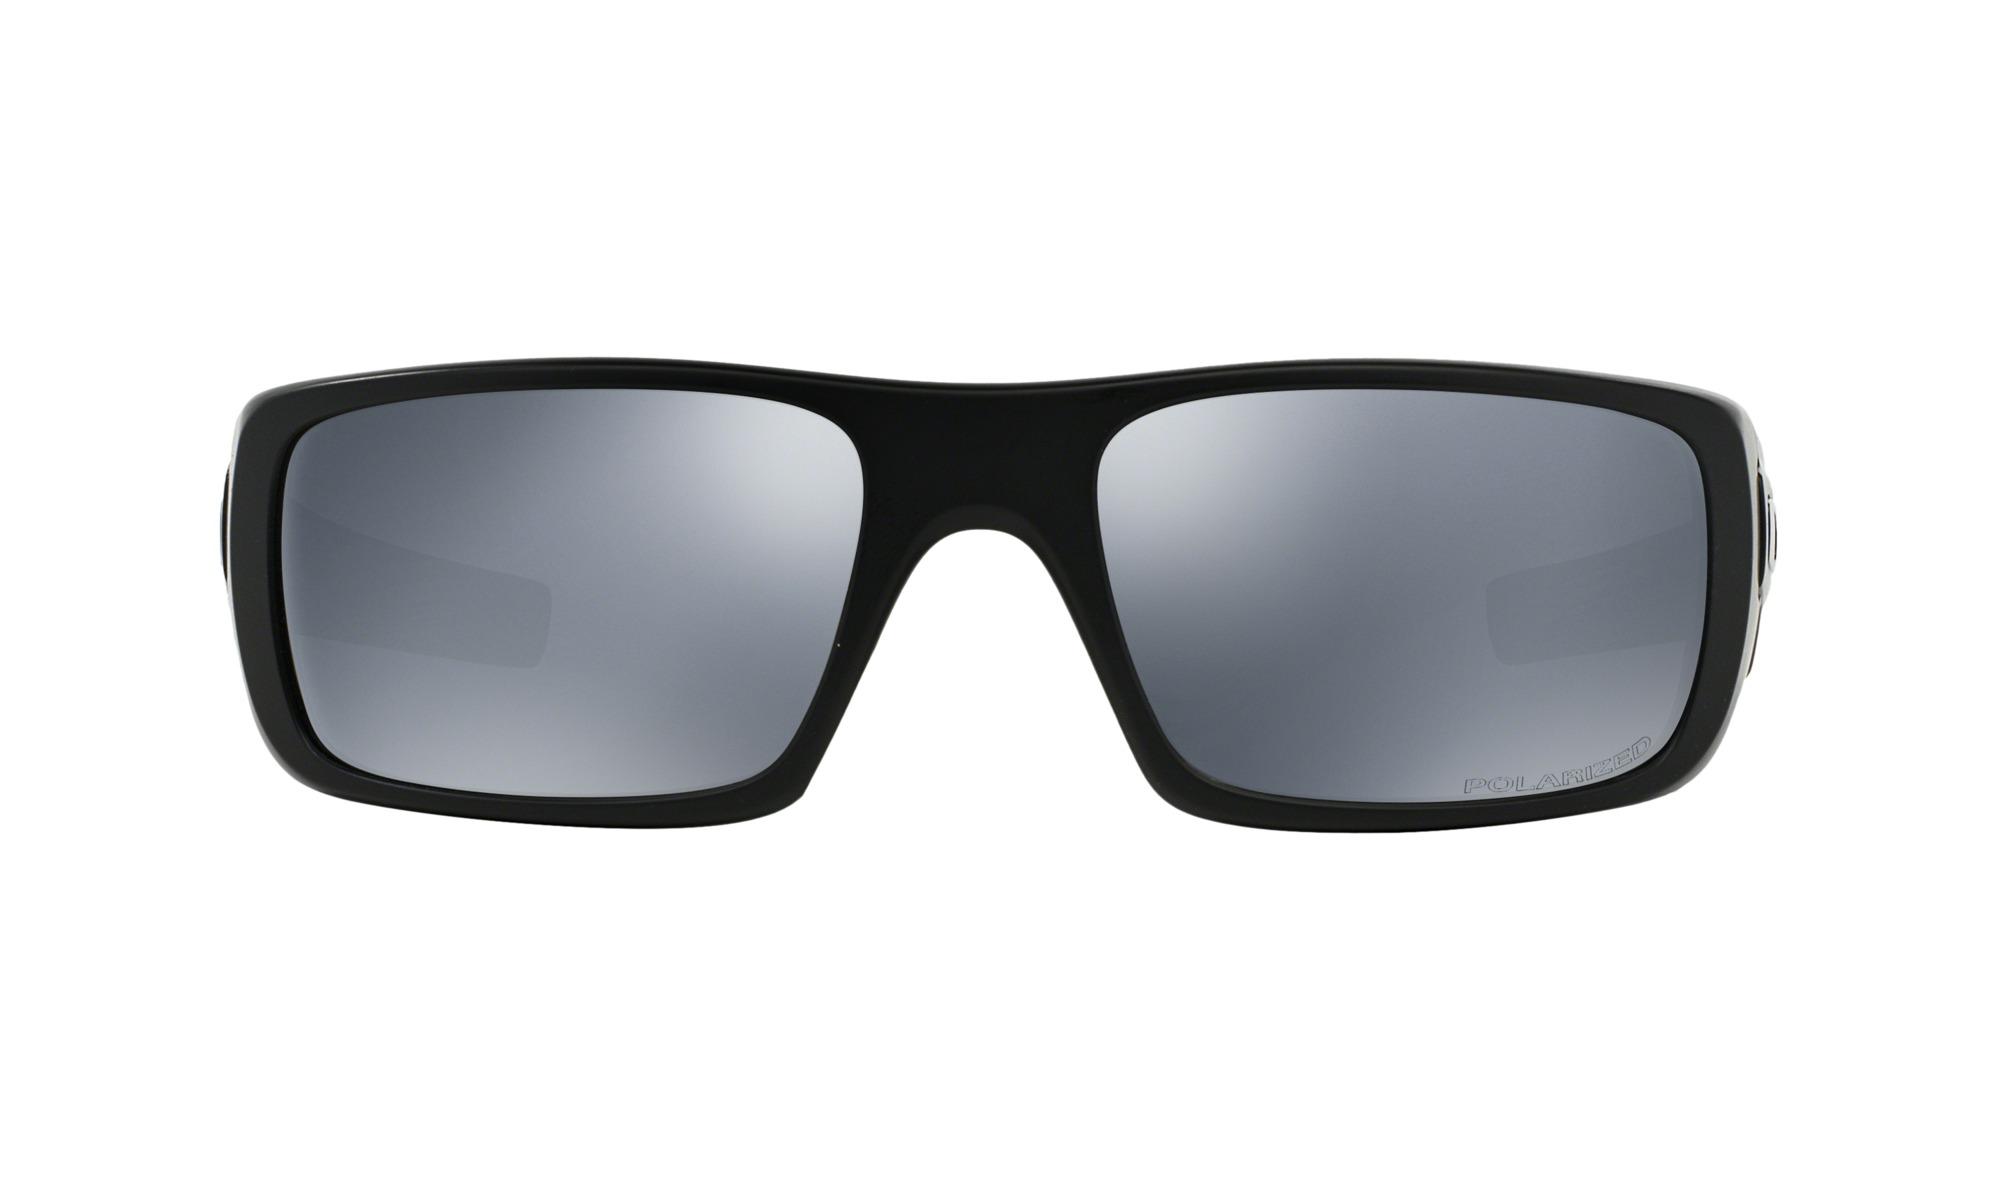 0181416b065f Oakley Crankshaft Men's Sunglasses – Matte Blk w/ Blk Iridium Polarized Lens.  🔍. $173.00